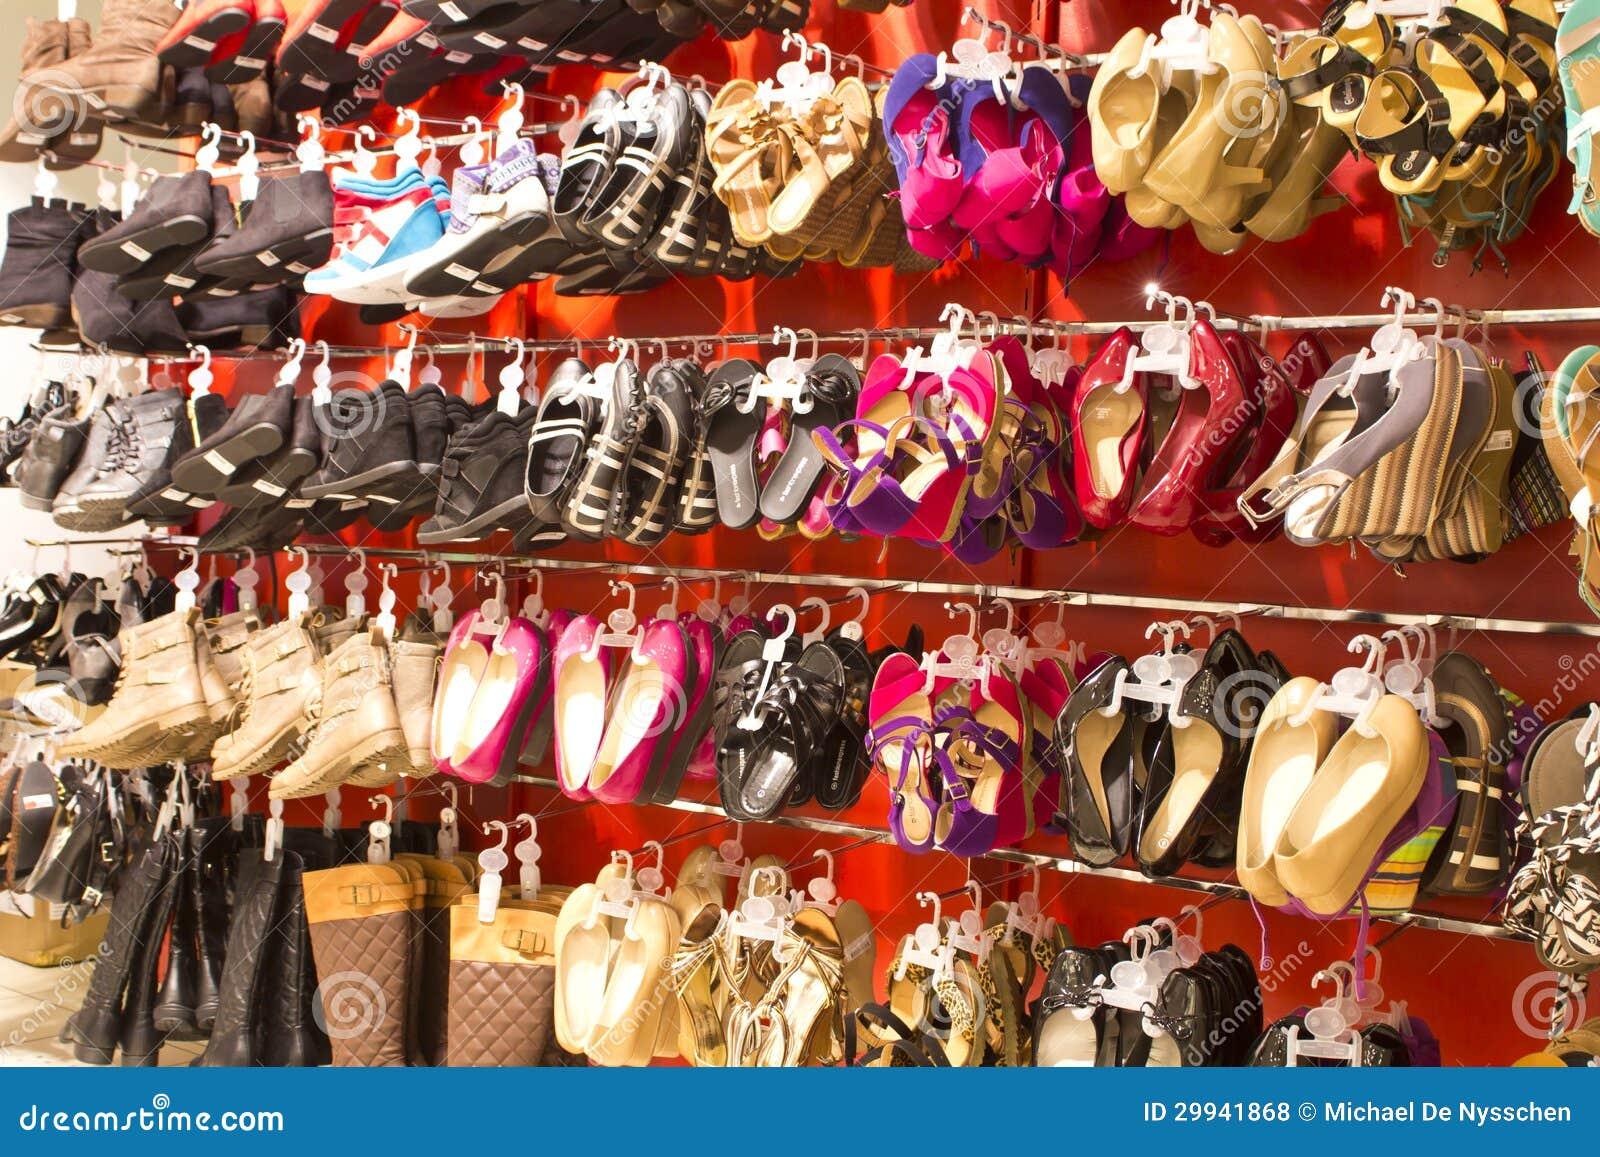 getragene Schuhe verkaufen - Forum - erdbeerloungede